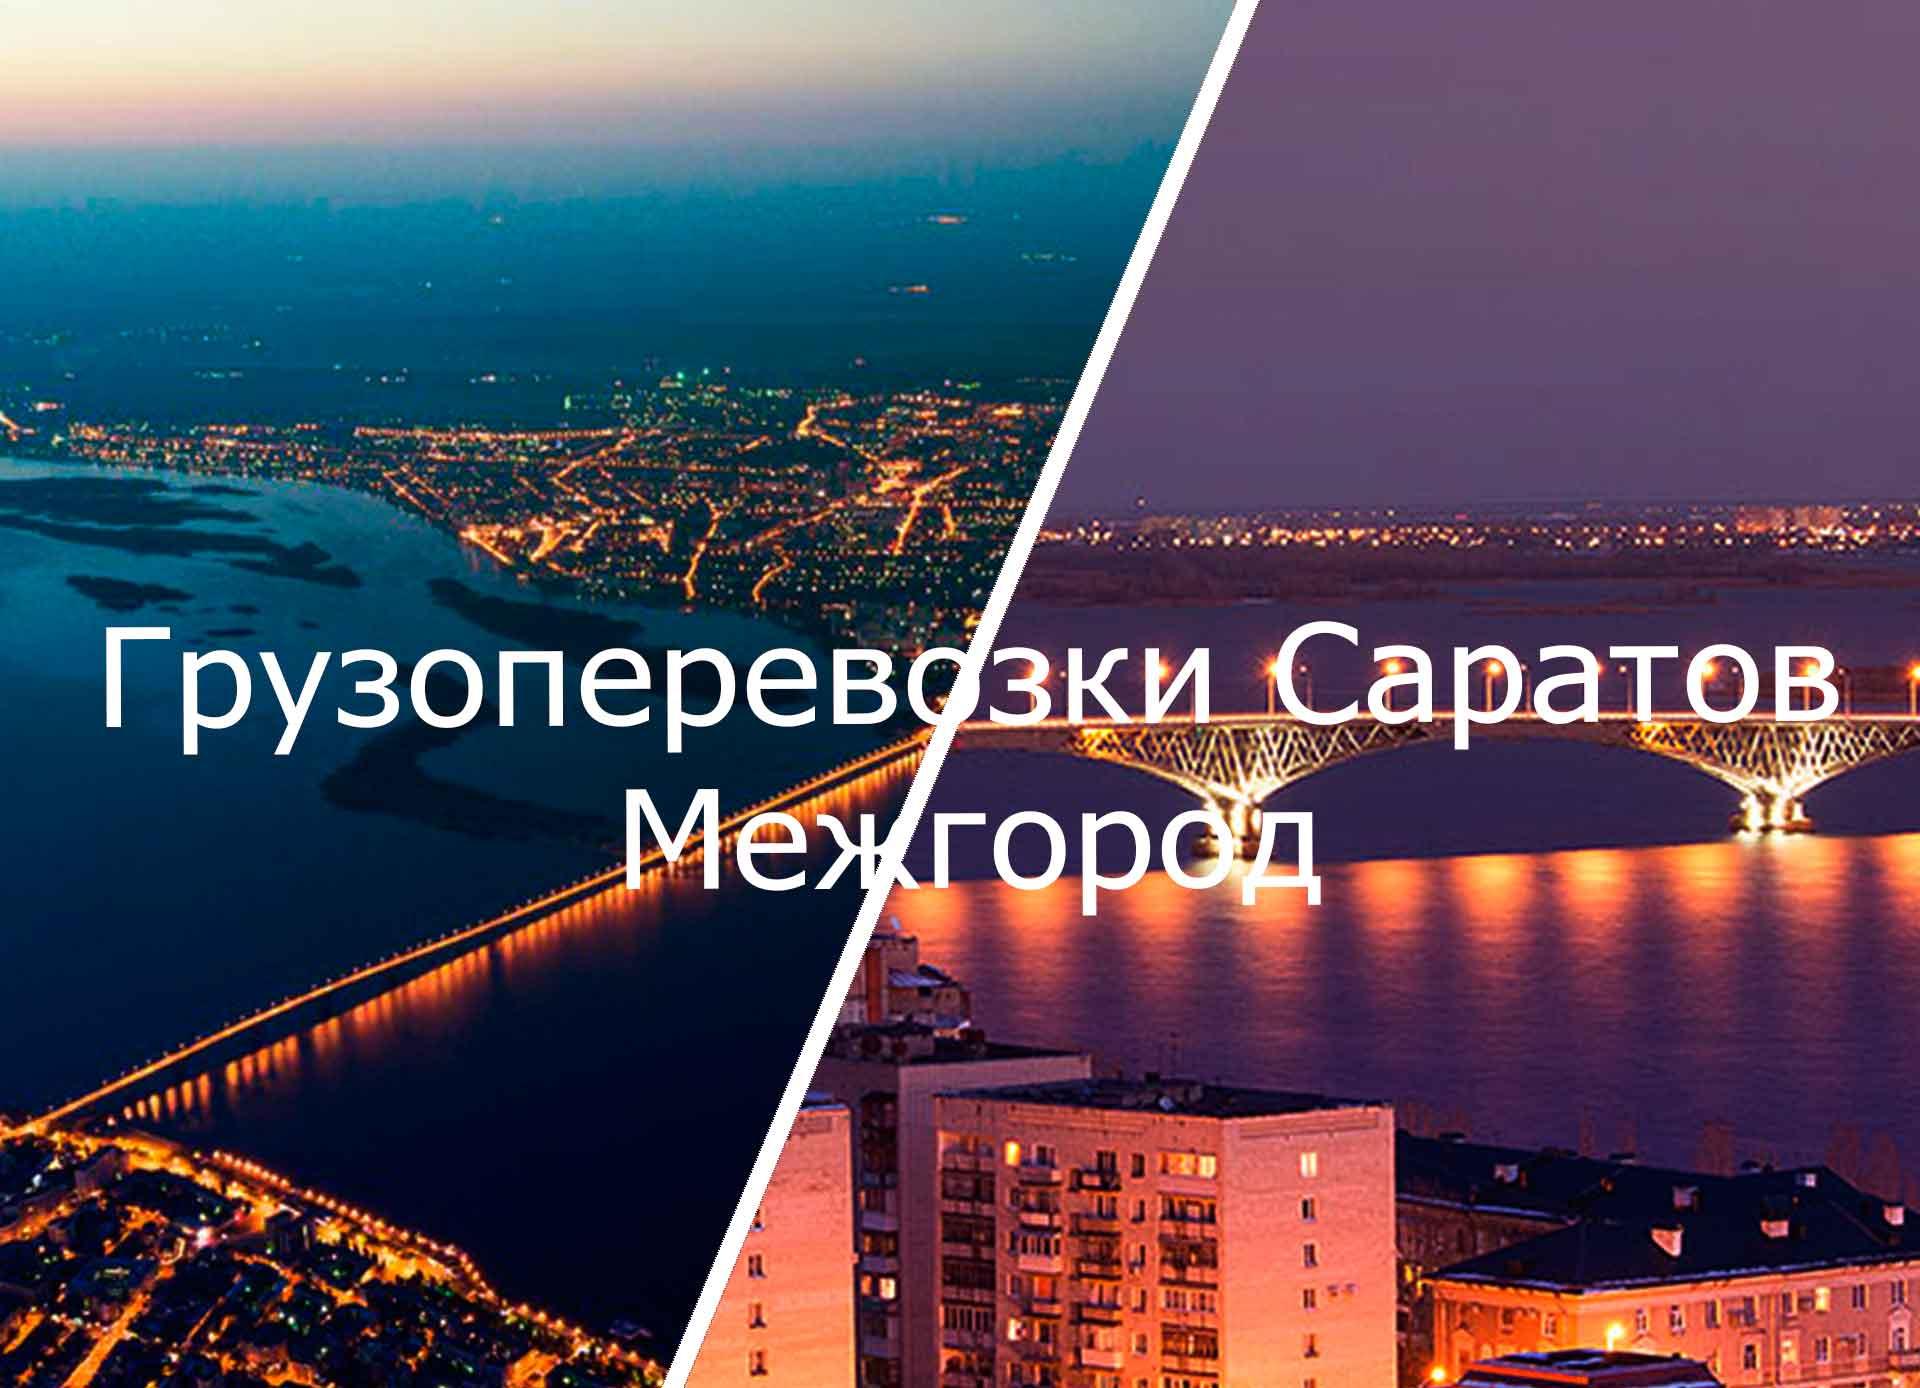 грузоперевозки саратов межгород